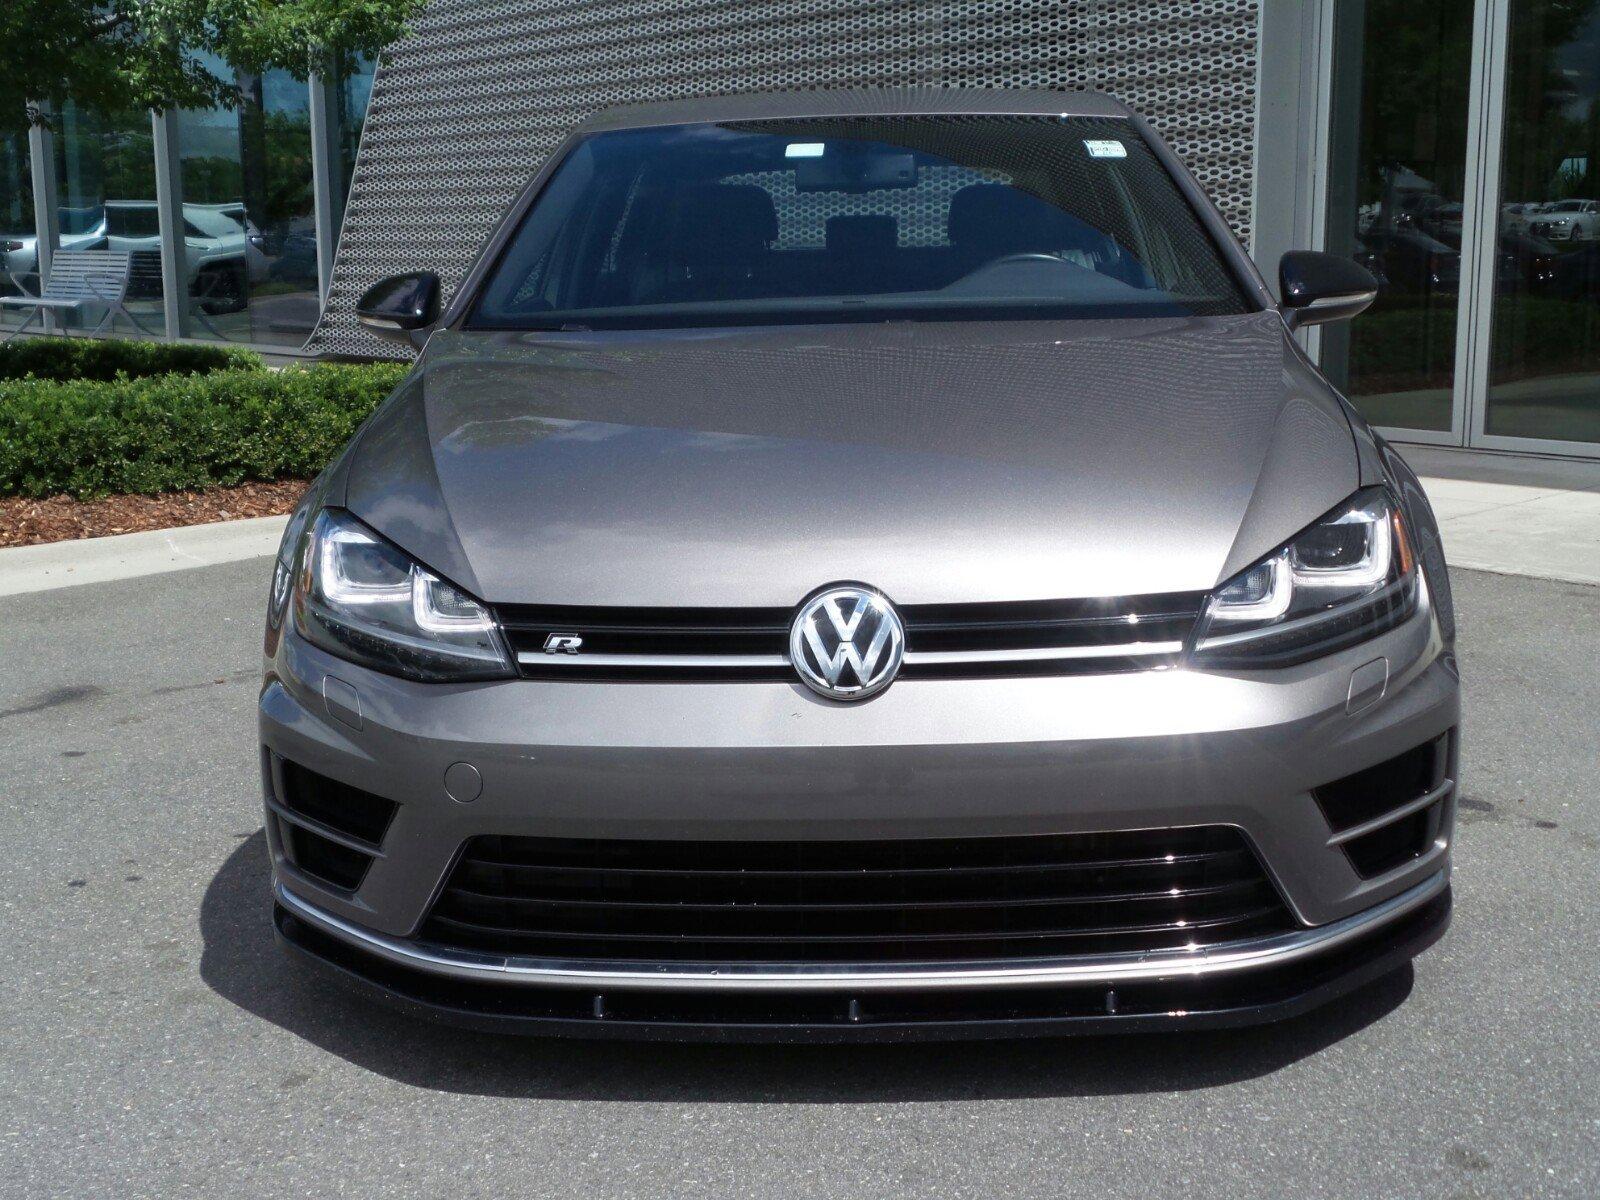 Pre-Owned 2016 Volkswagen Golf R 4dr HB Man